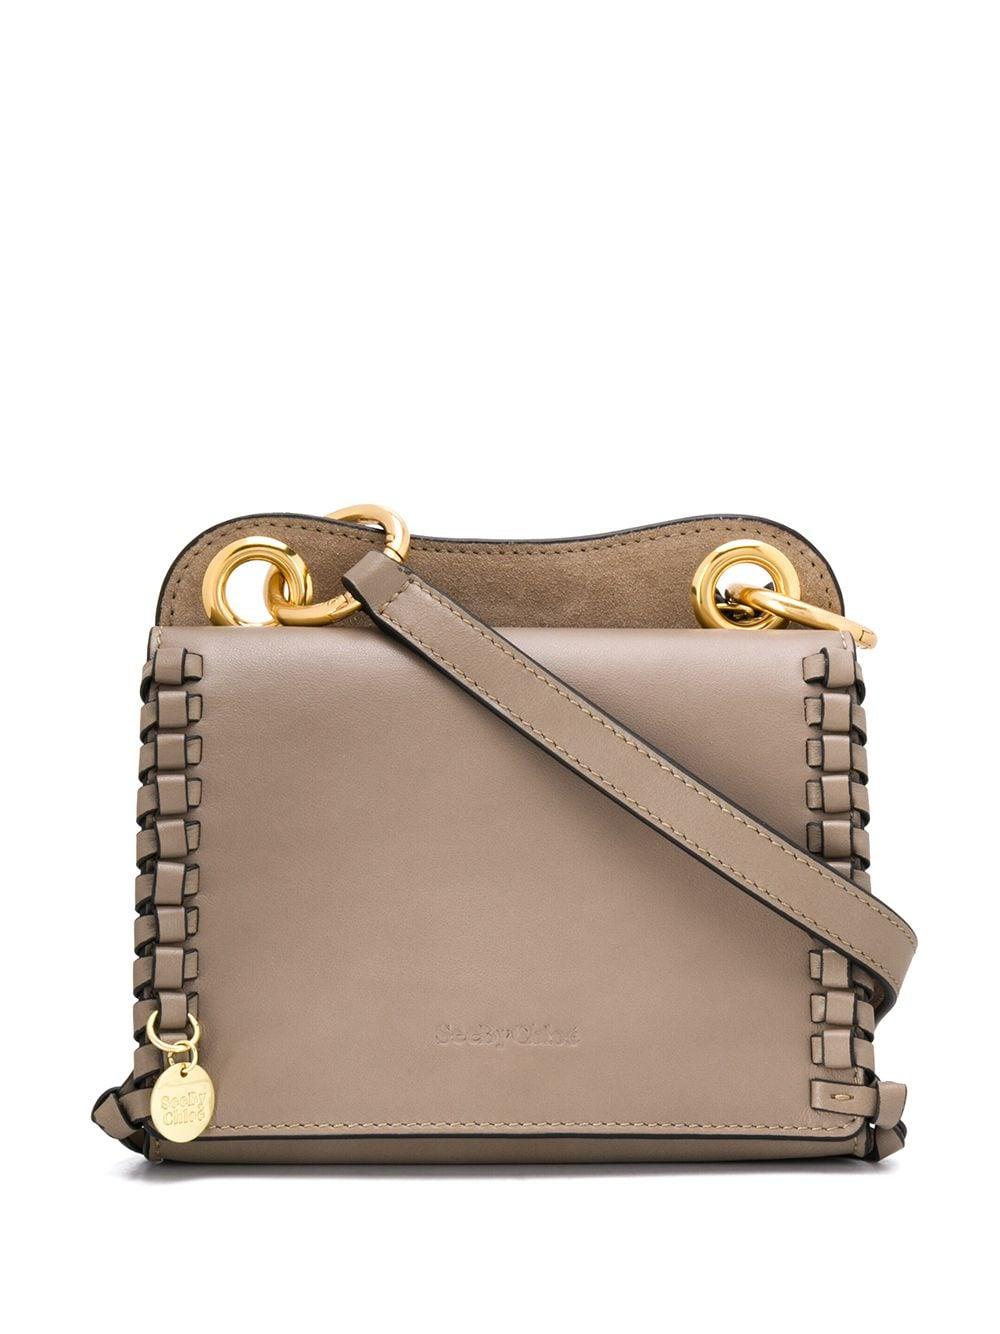 Tilda Leather Crossbody Bag